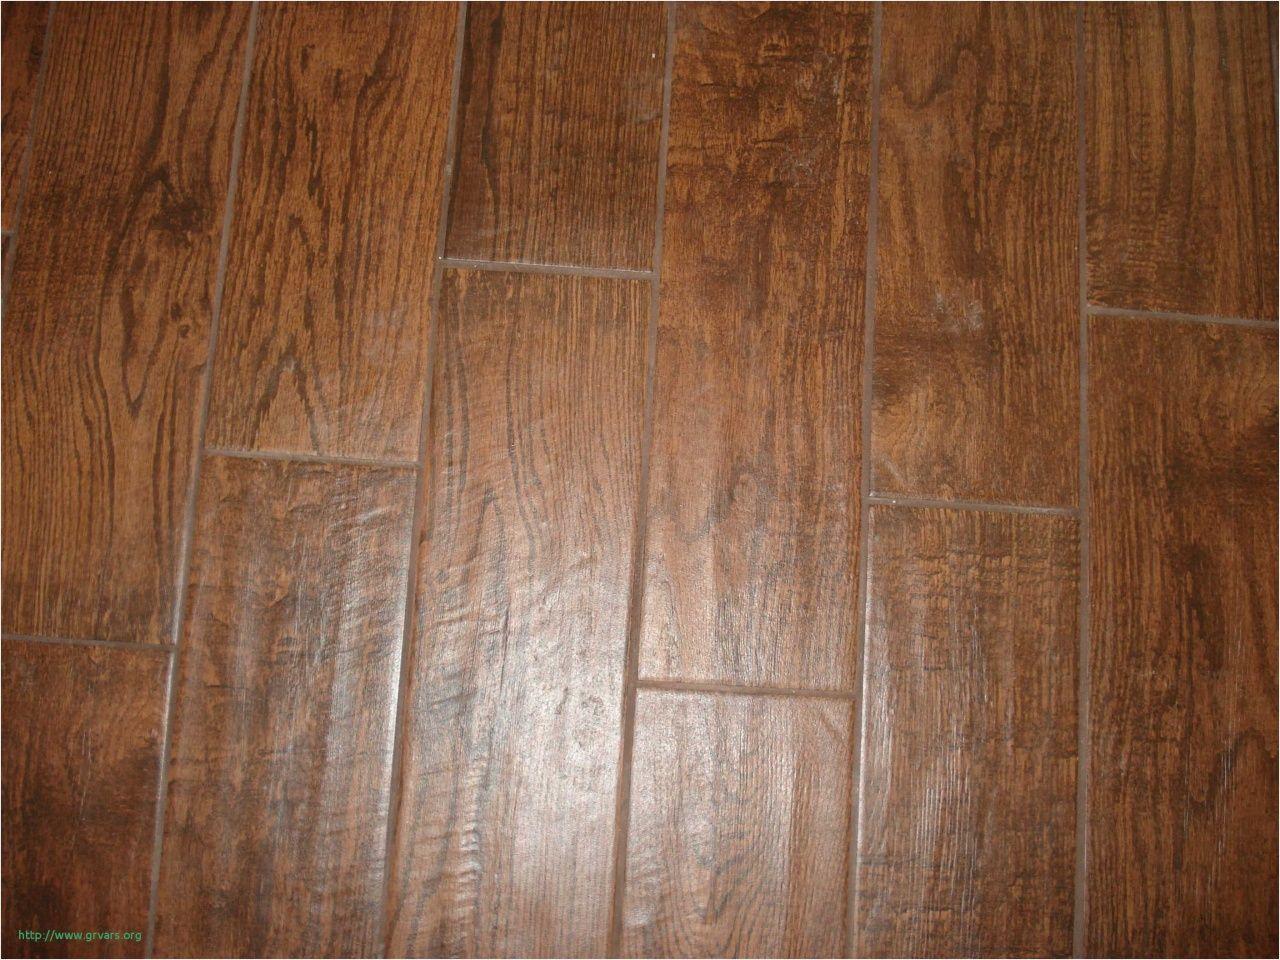 Home Depot Hardwood Flooring Installation Cost In 2020 Laminate Flooring Prices Wood Laminate Flooring Hardwood Flooring Prices